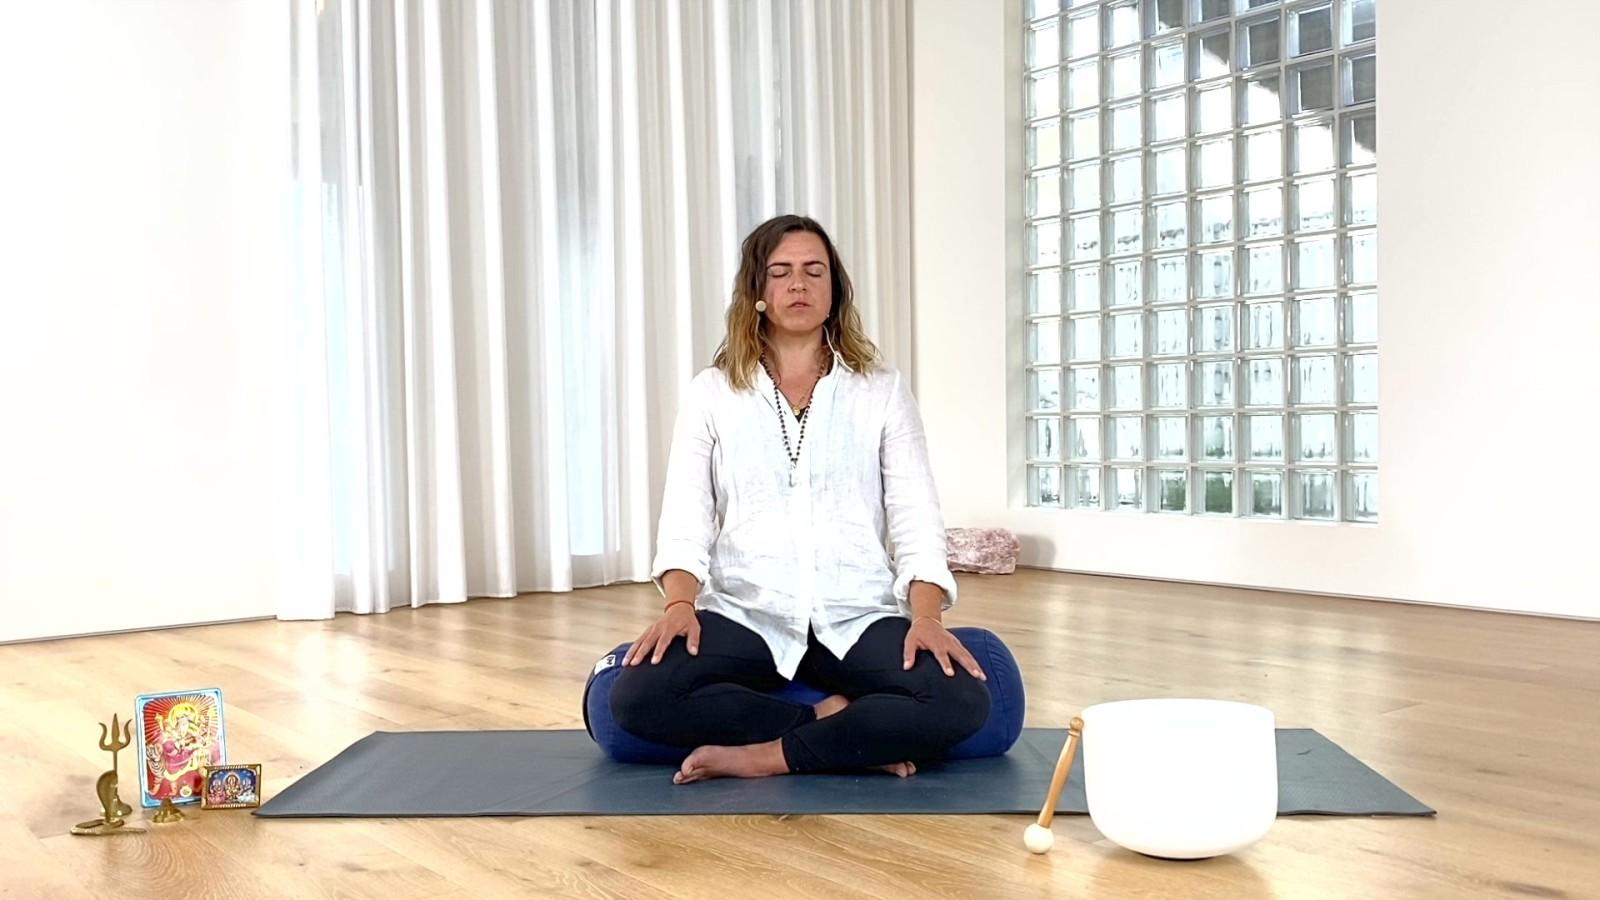 Return to Balance with Irene Ais